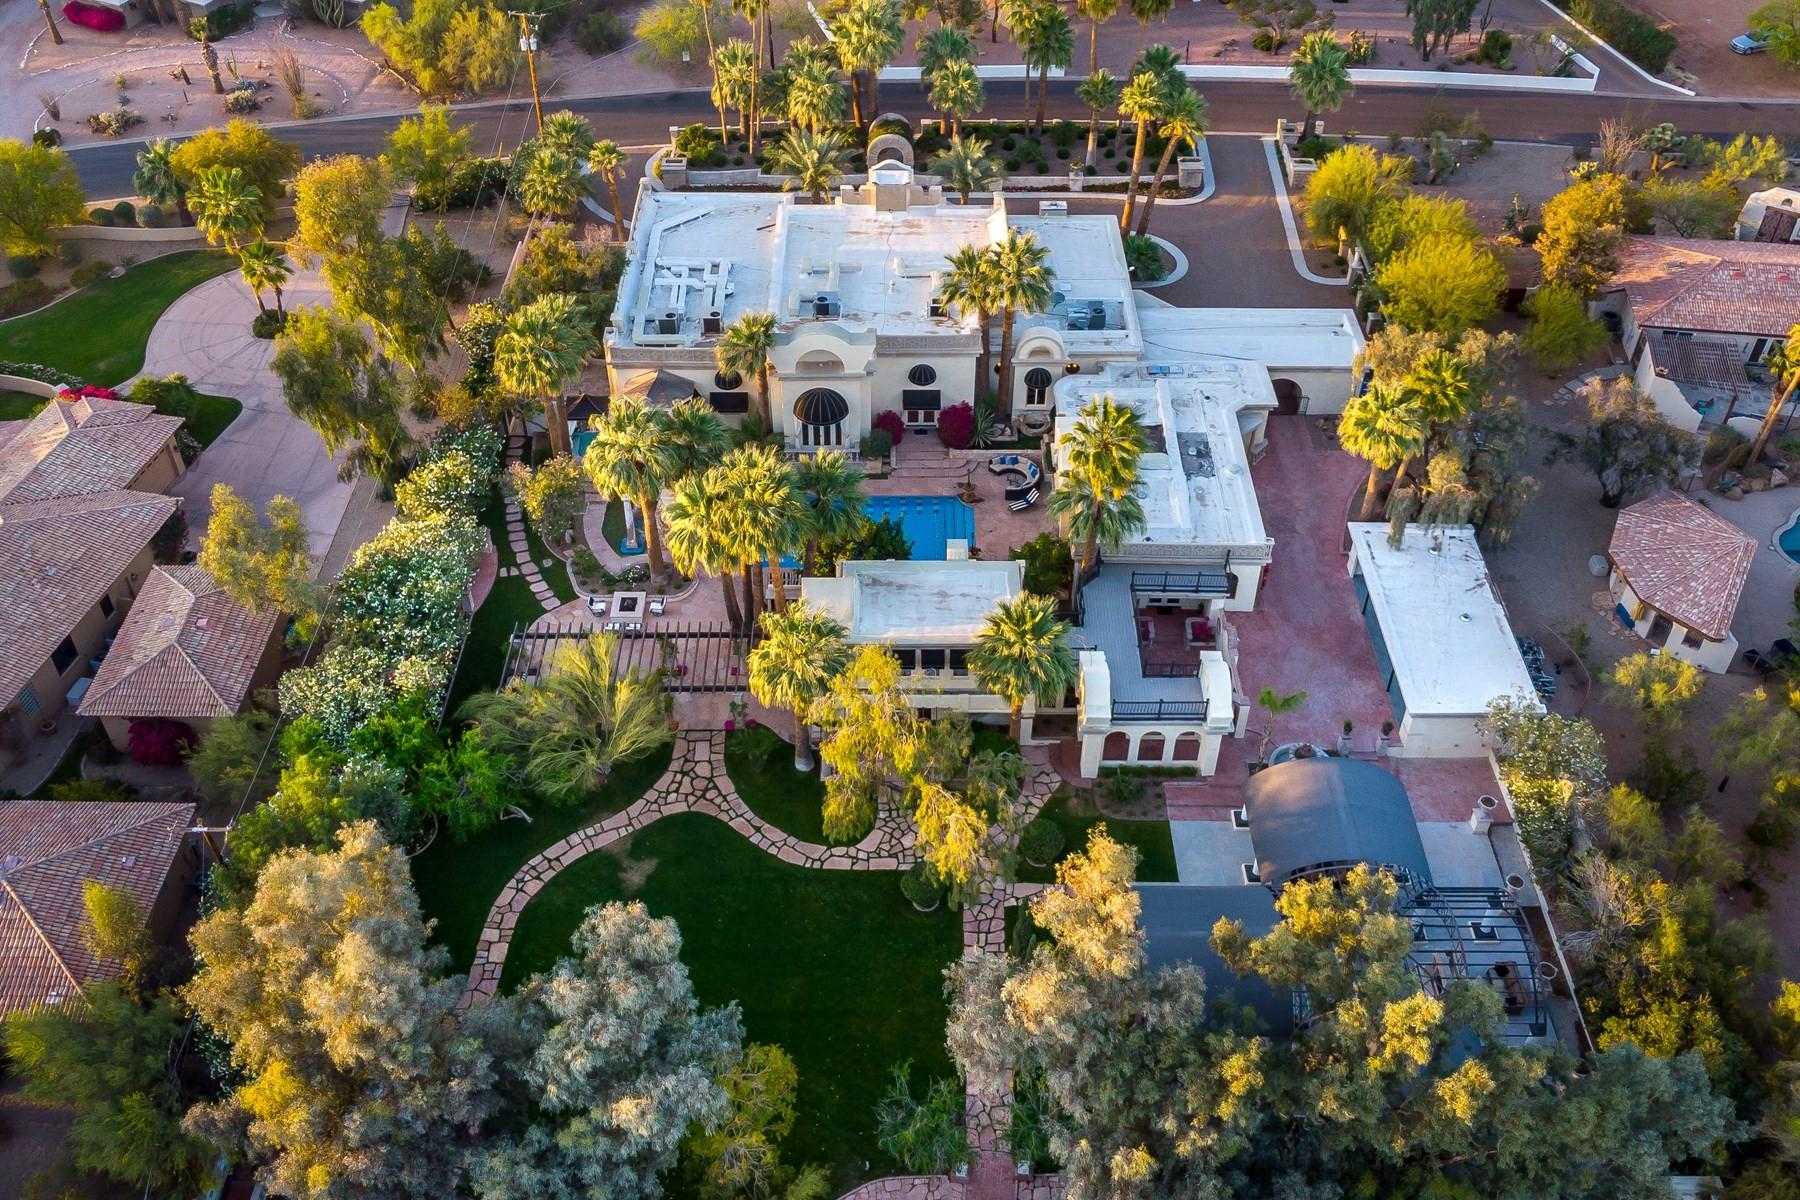 Single Family Homes for Active at Opulent European Neoclassical Estate 5333 E Palomino Rd Phoenix, Arizona 85018 United States